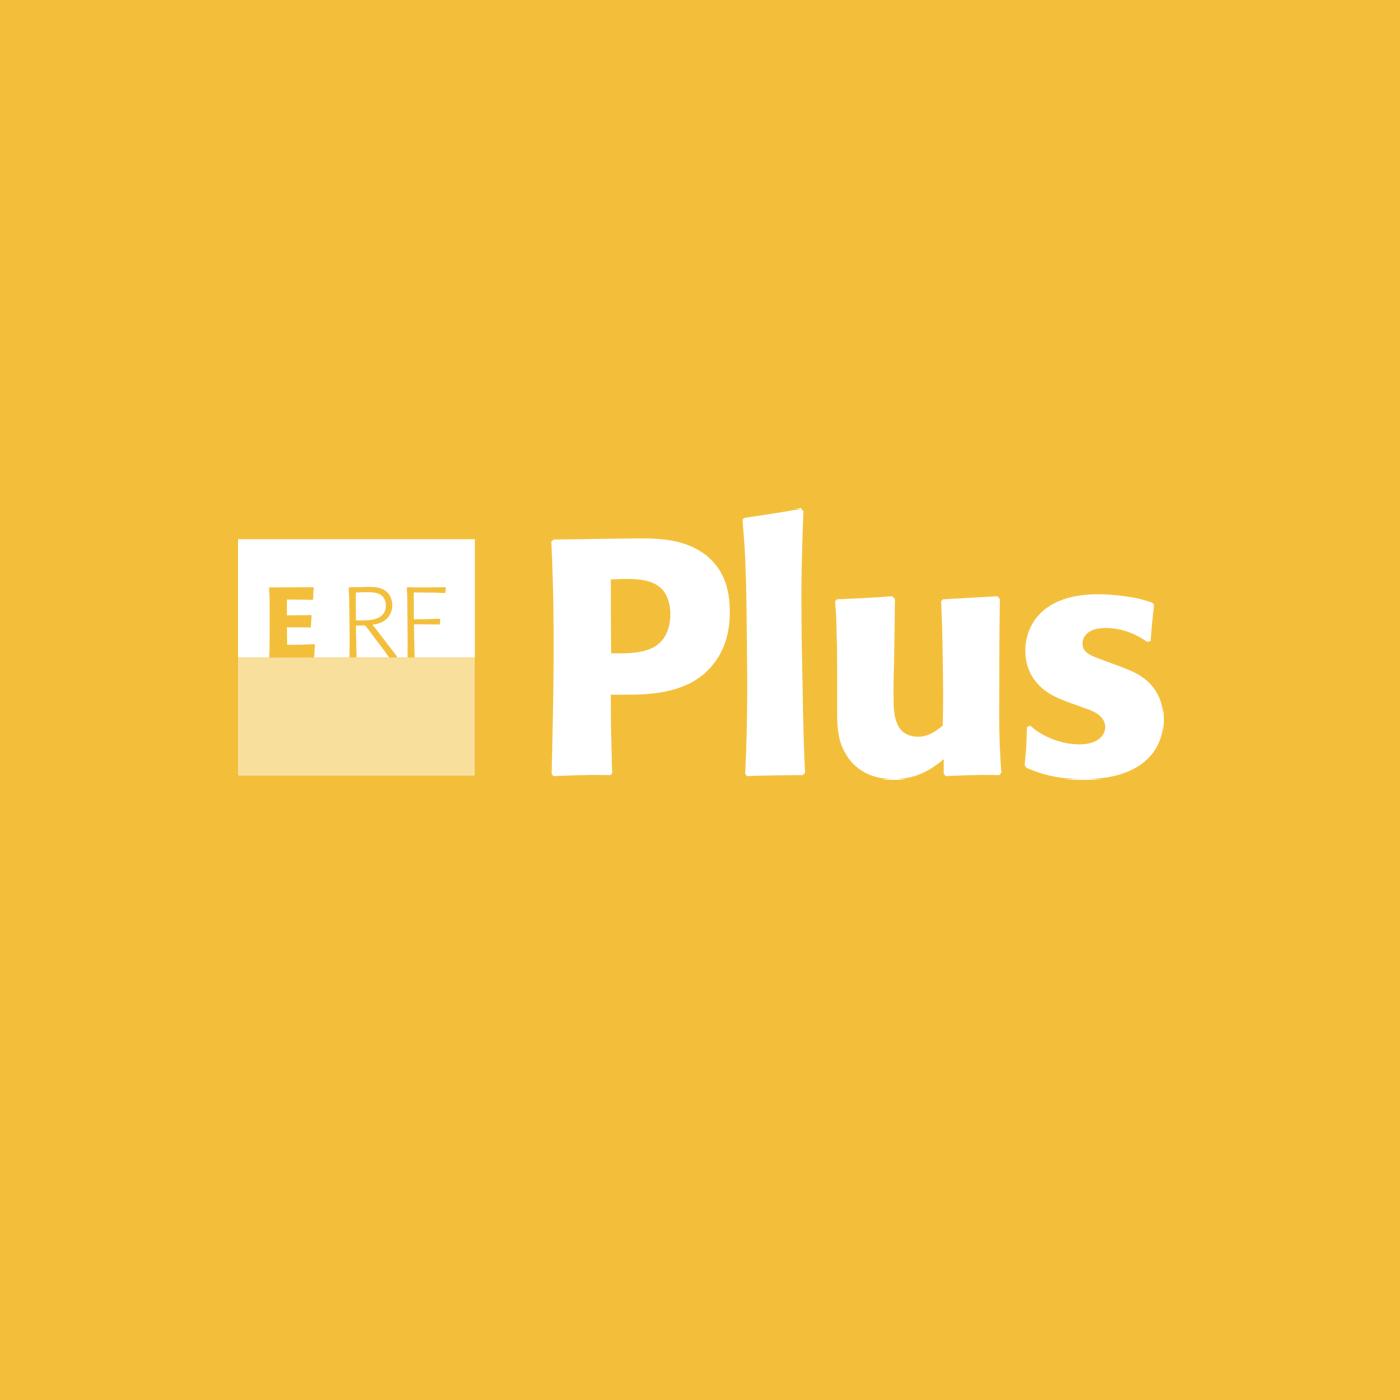 ERF Plus - Wort zum Tag